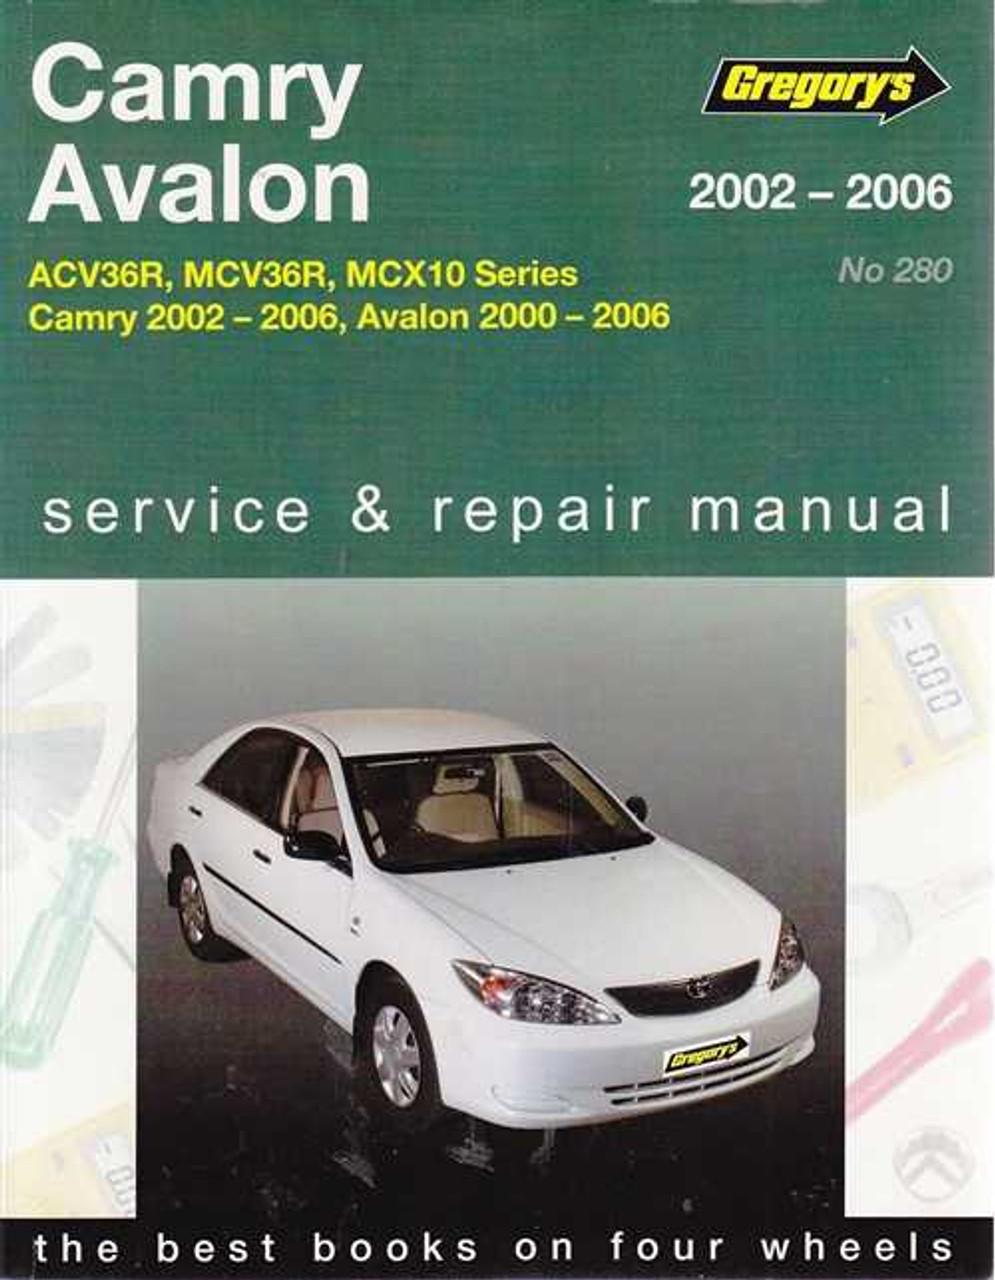 toyota camry avalon acv36r mcv36r mcx10 series 2000 2006 rh automotobookshop com au toyota avalon 2000 repair manual 2006 Toyota Avalon